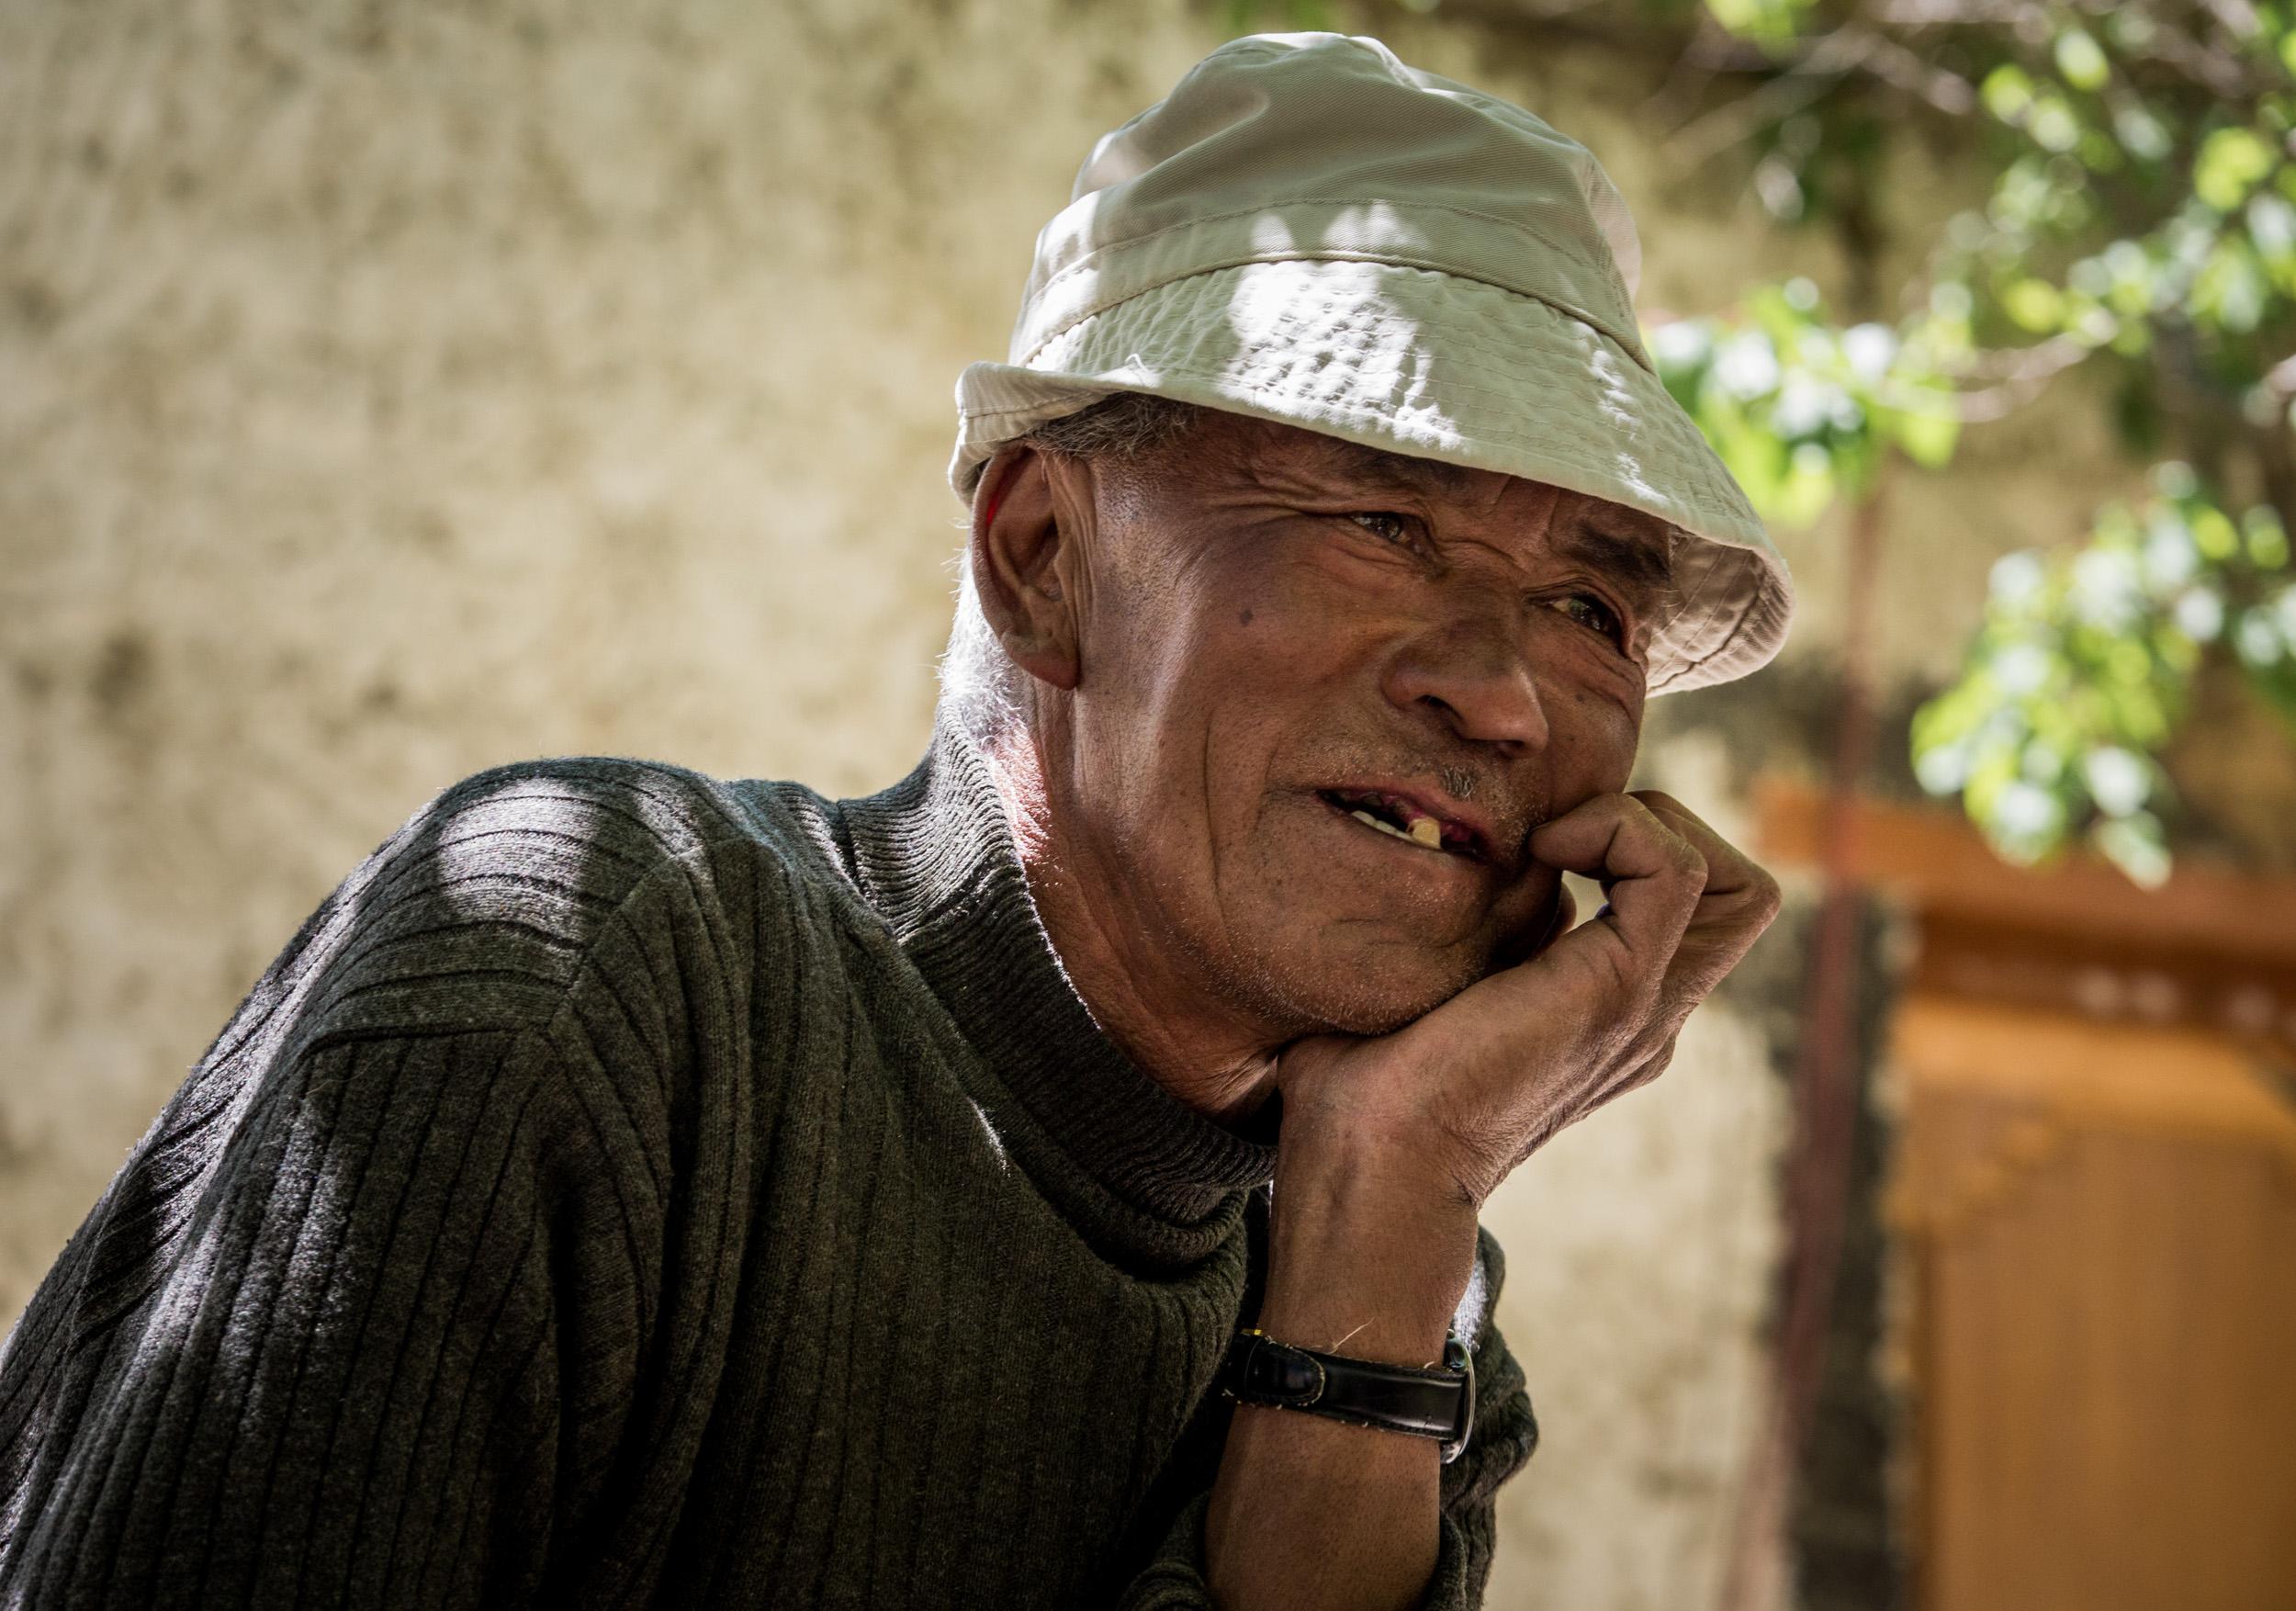 _11 Old man smilling Markha Valley India.jpg